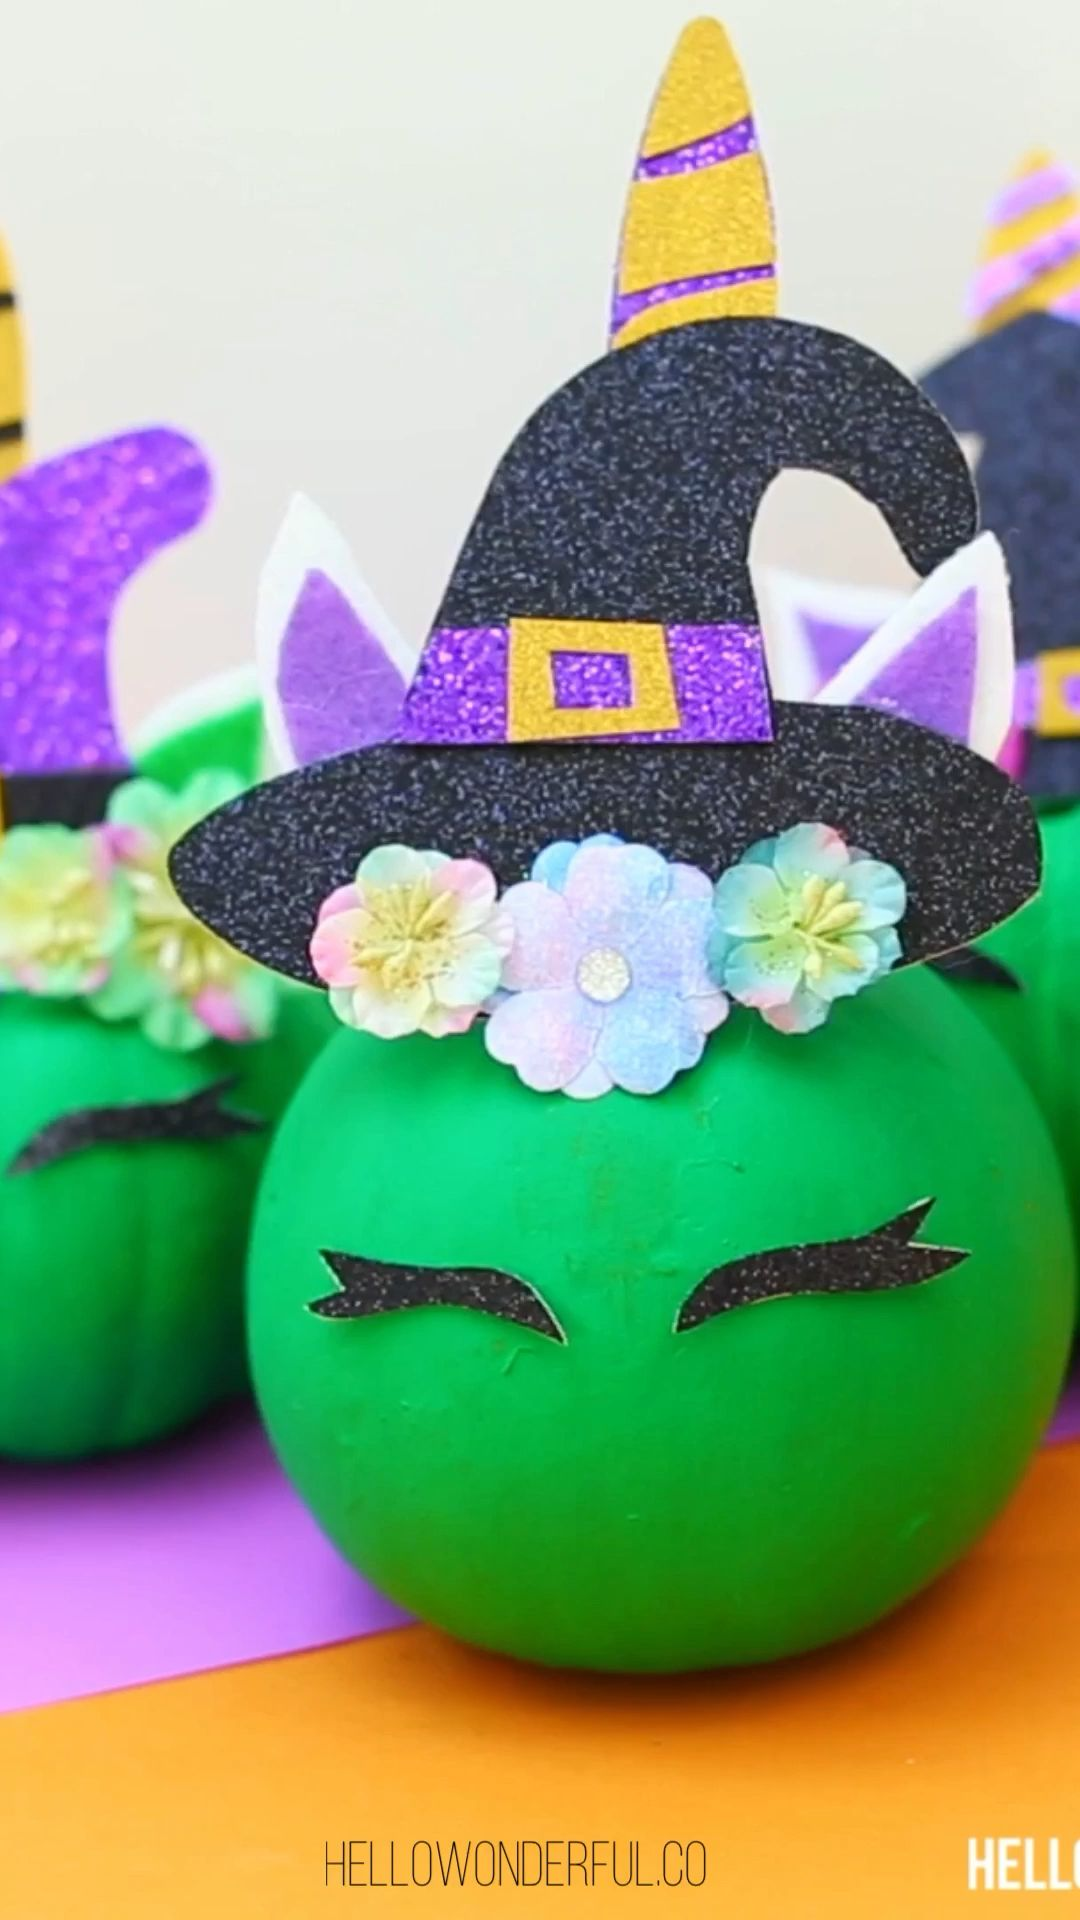 DIY Unicorn Pumpkin Witch - Unicorn pumpkin, Halloween toilet paper roll crafts, Pumpkin crafts, Unicorn crafts, Crafts, Diy garland paper - This DIY Pumpkin Unicorn Witch brings big magic to Halloween and is a fun nocarve pumpkin decorating idea!